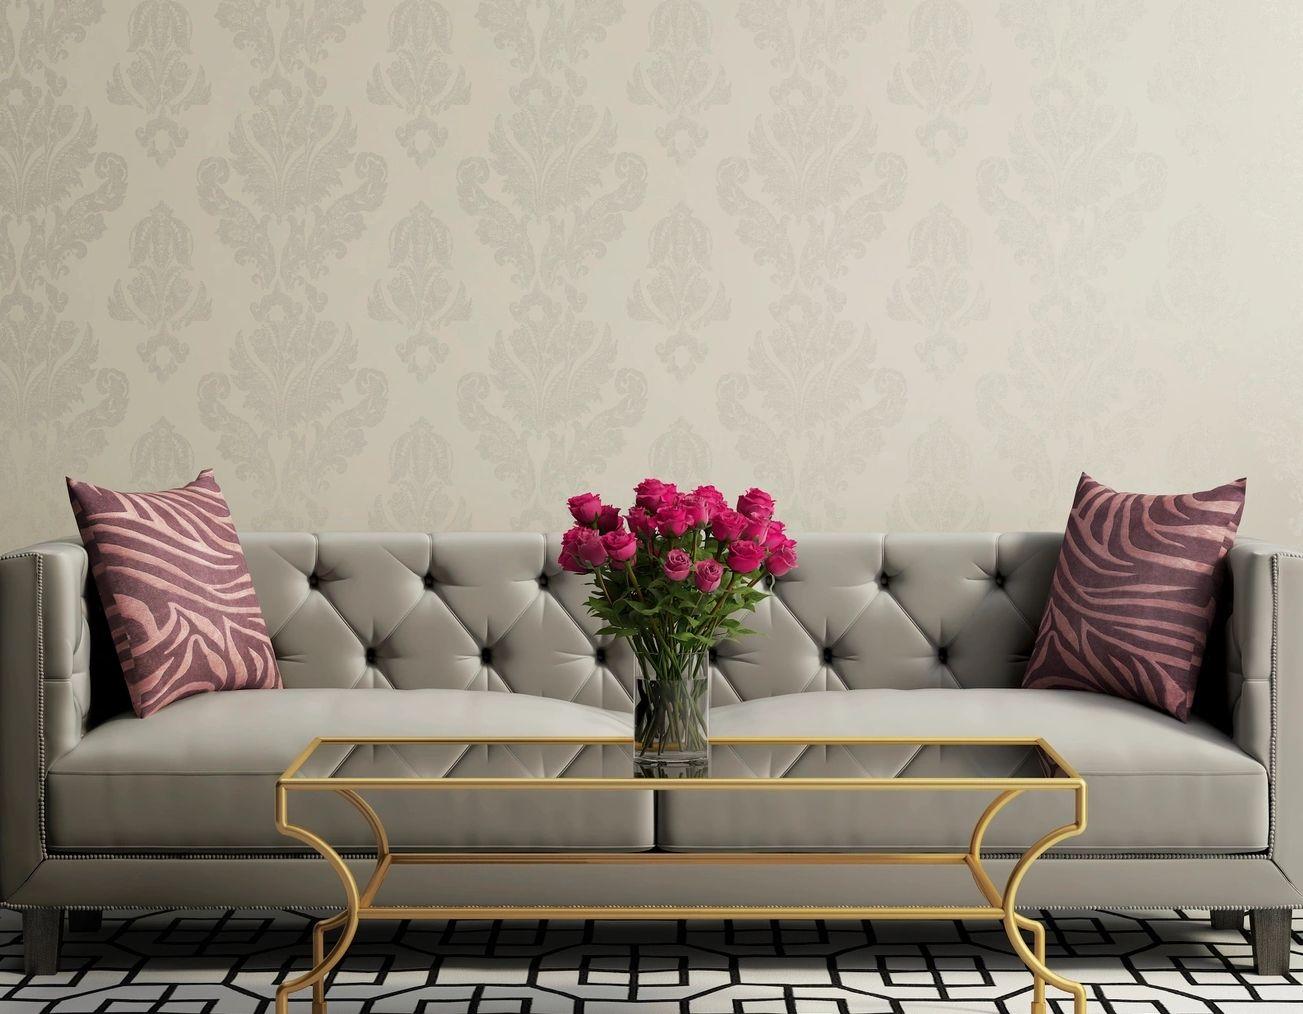 Groovy Payless Furniture Furniture Mattress Sofas Bedroom Dining Interior Design Ideas Tzicisoteloinfo